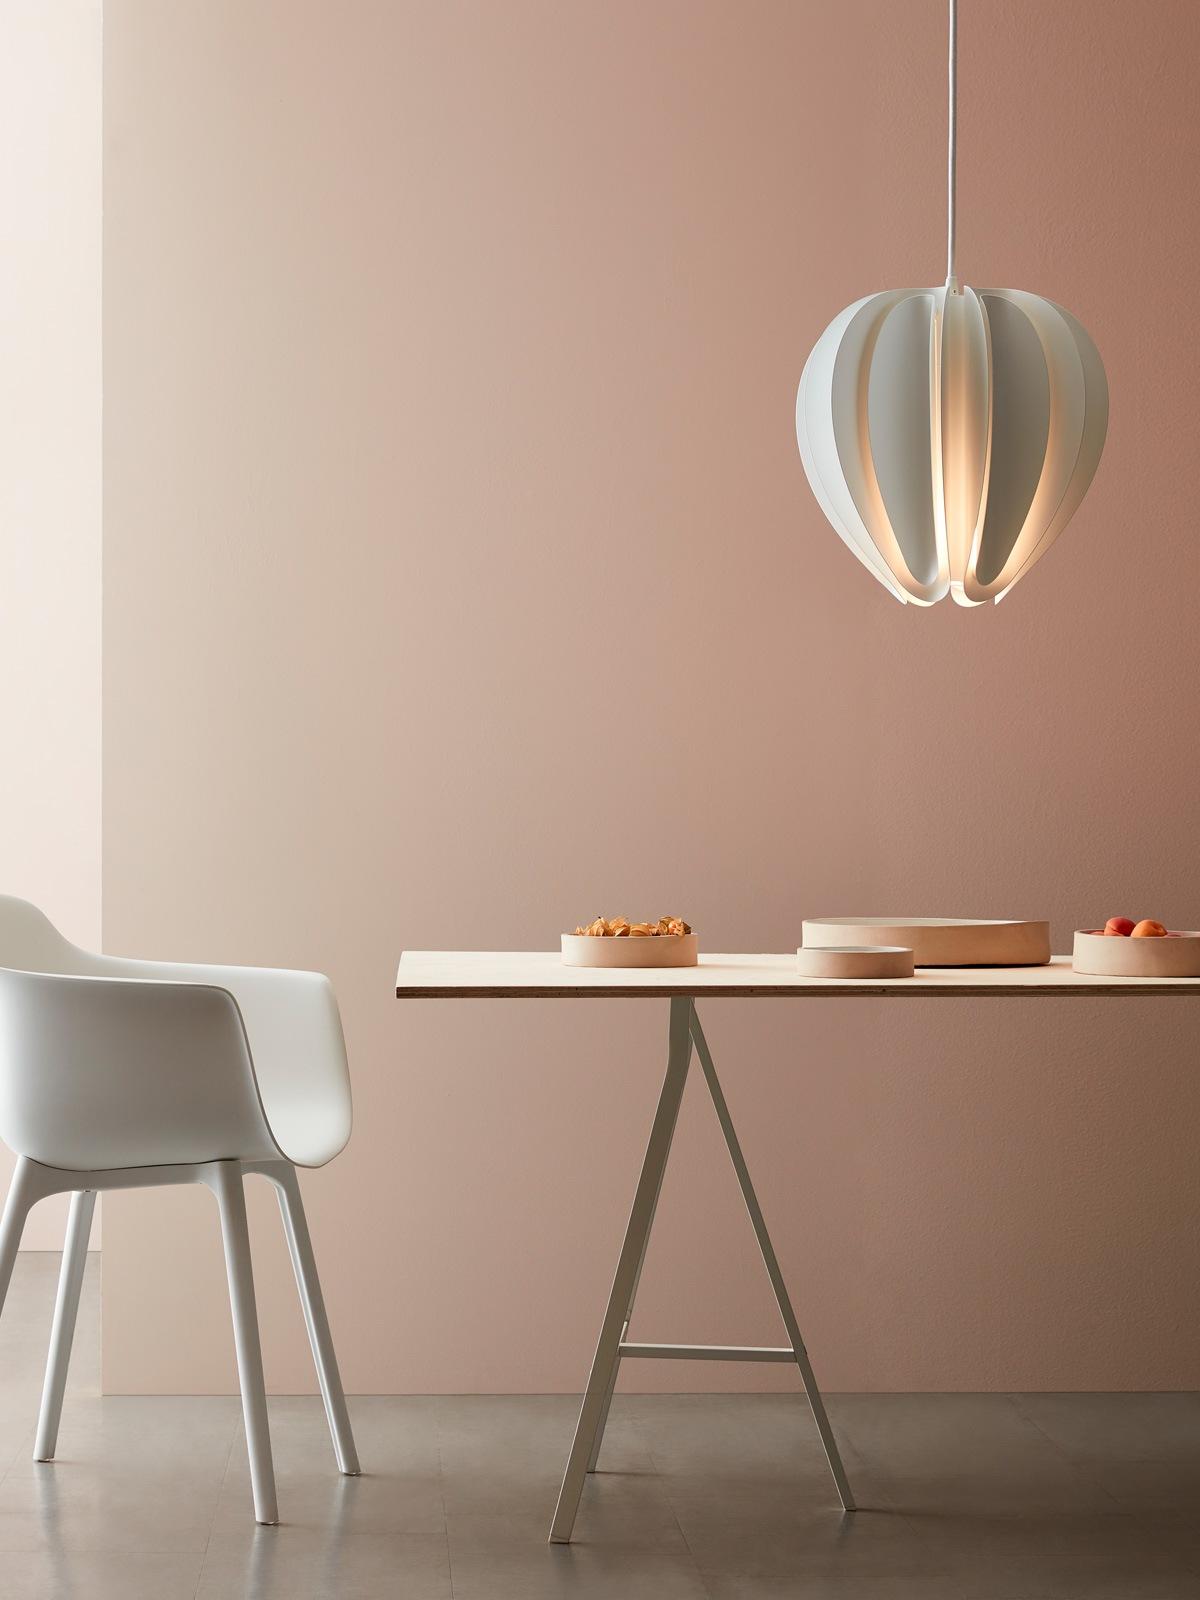 Florale Pendelleuchten Belid Tulip Pendelleuchte DesignOrt Lampen Berlin Onlineshop